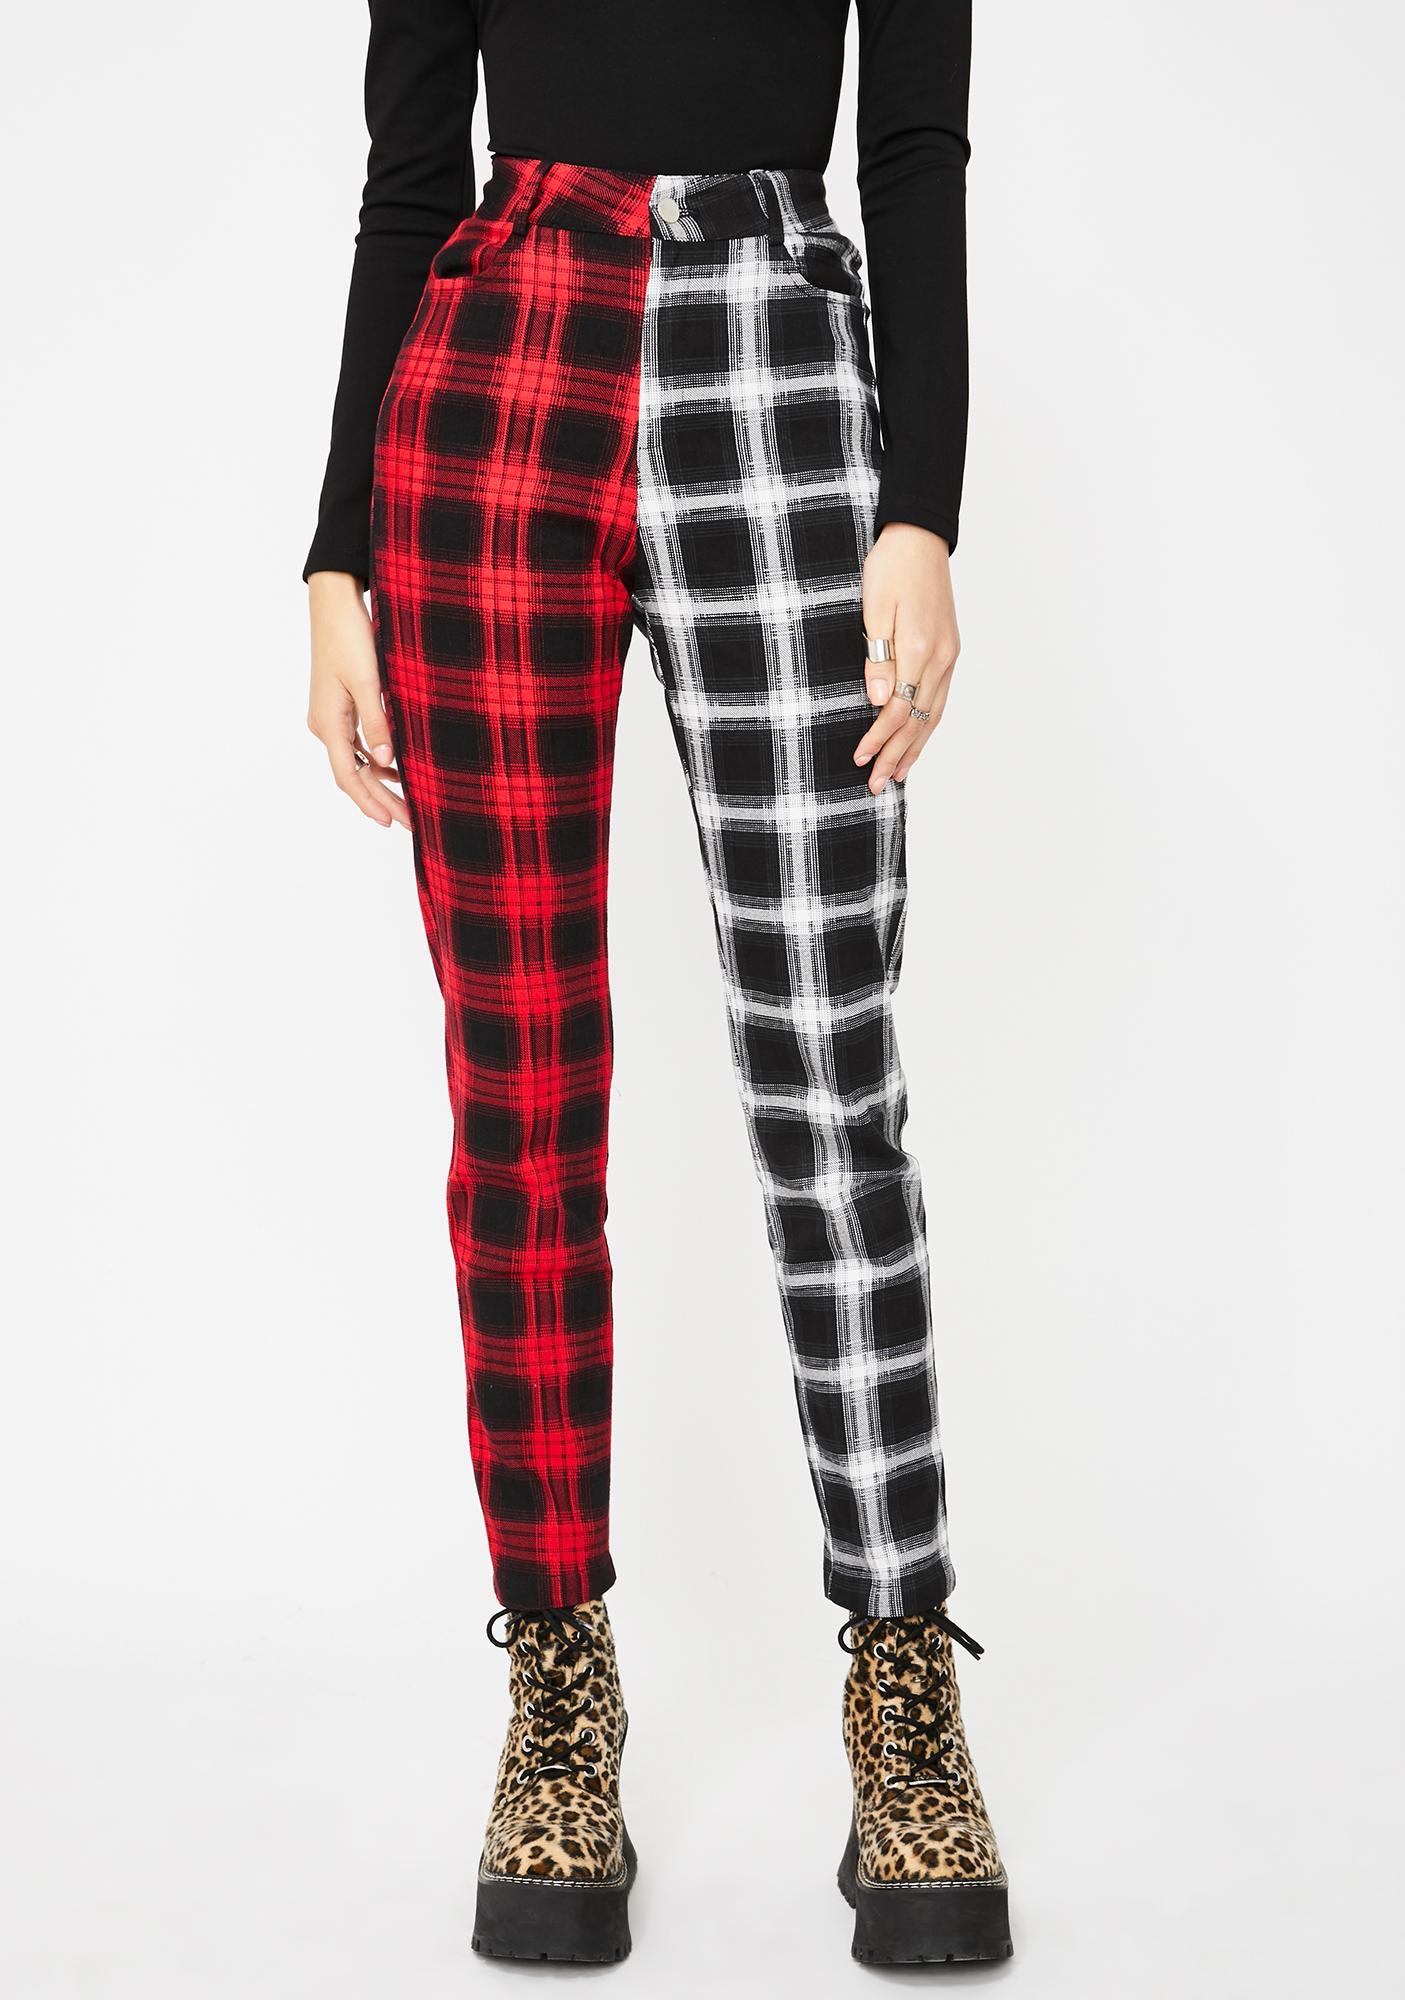 Jawbreaker Two Checkered Slim Trousers